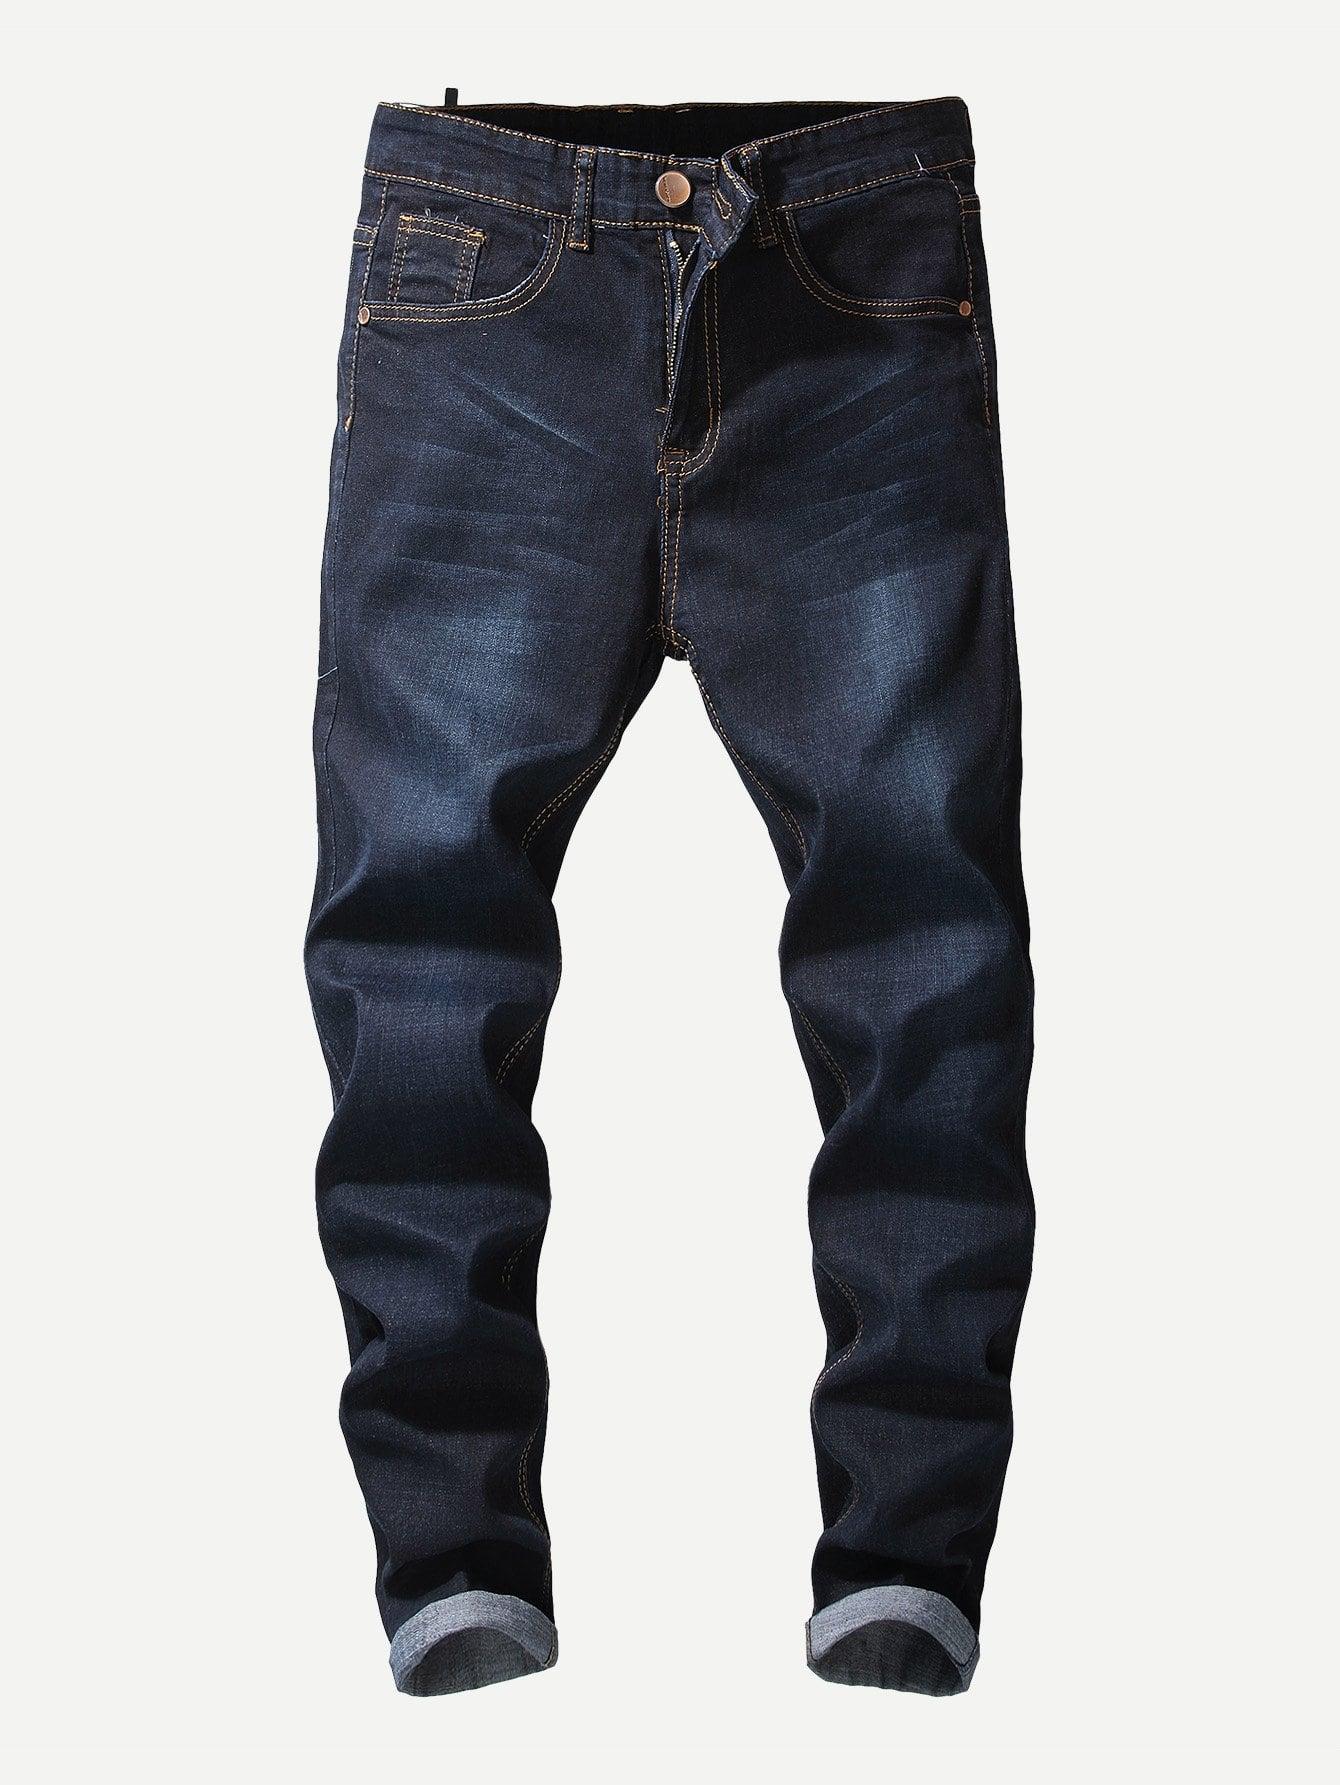 Men Wash Jeans